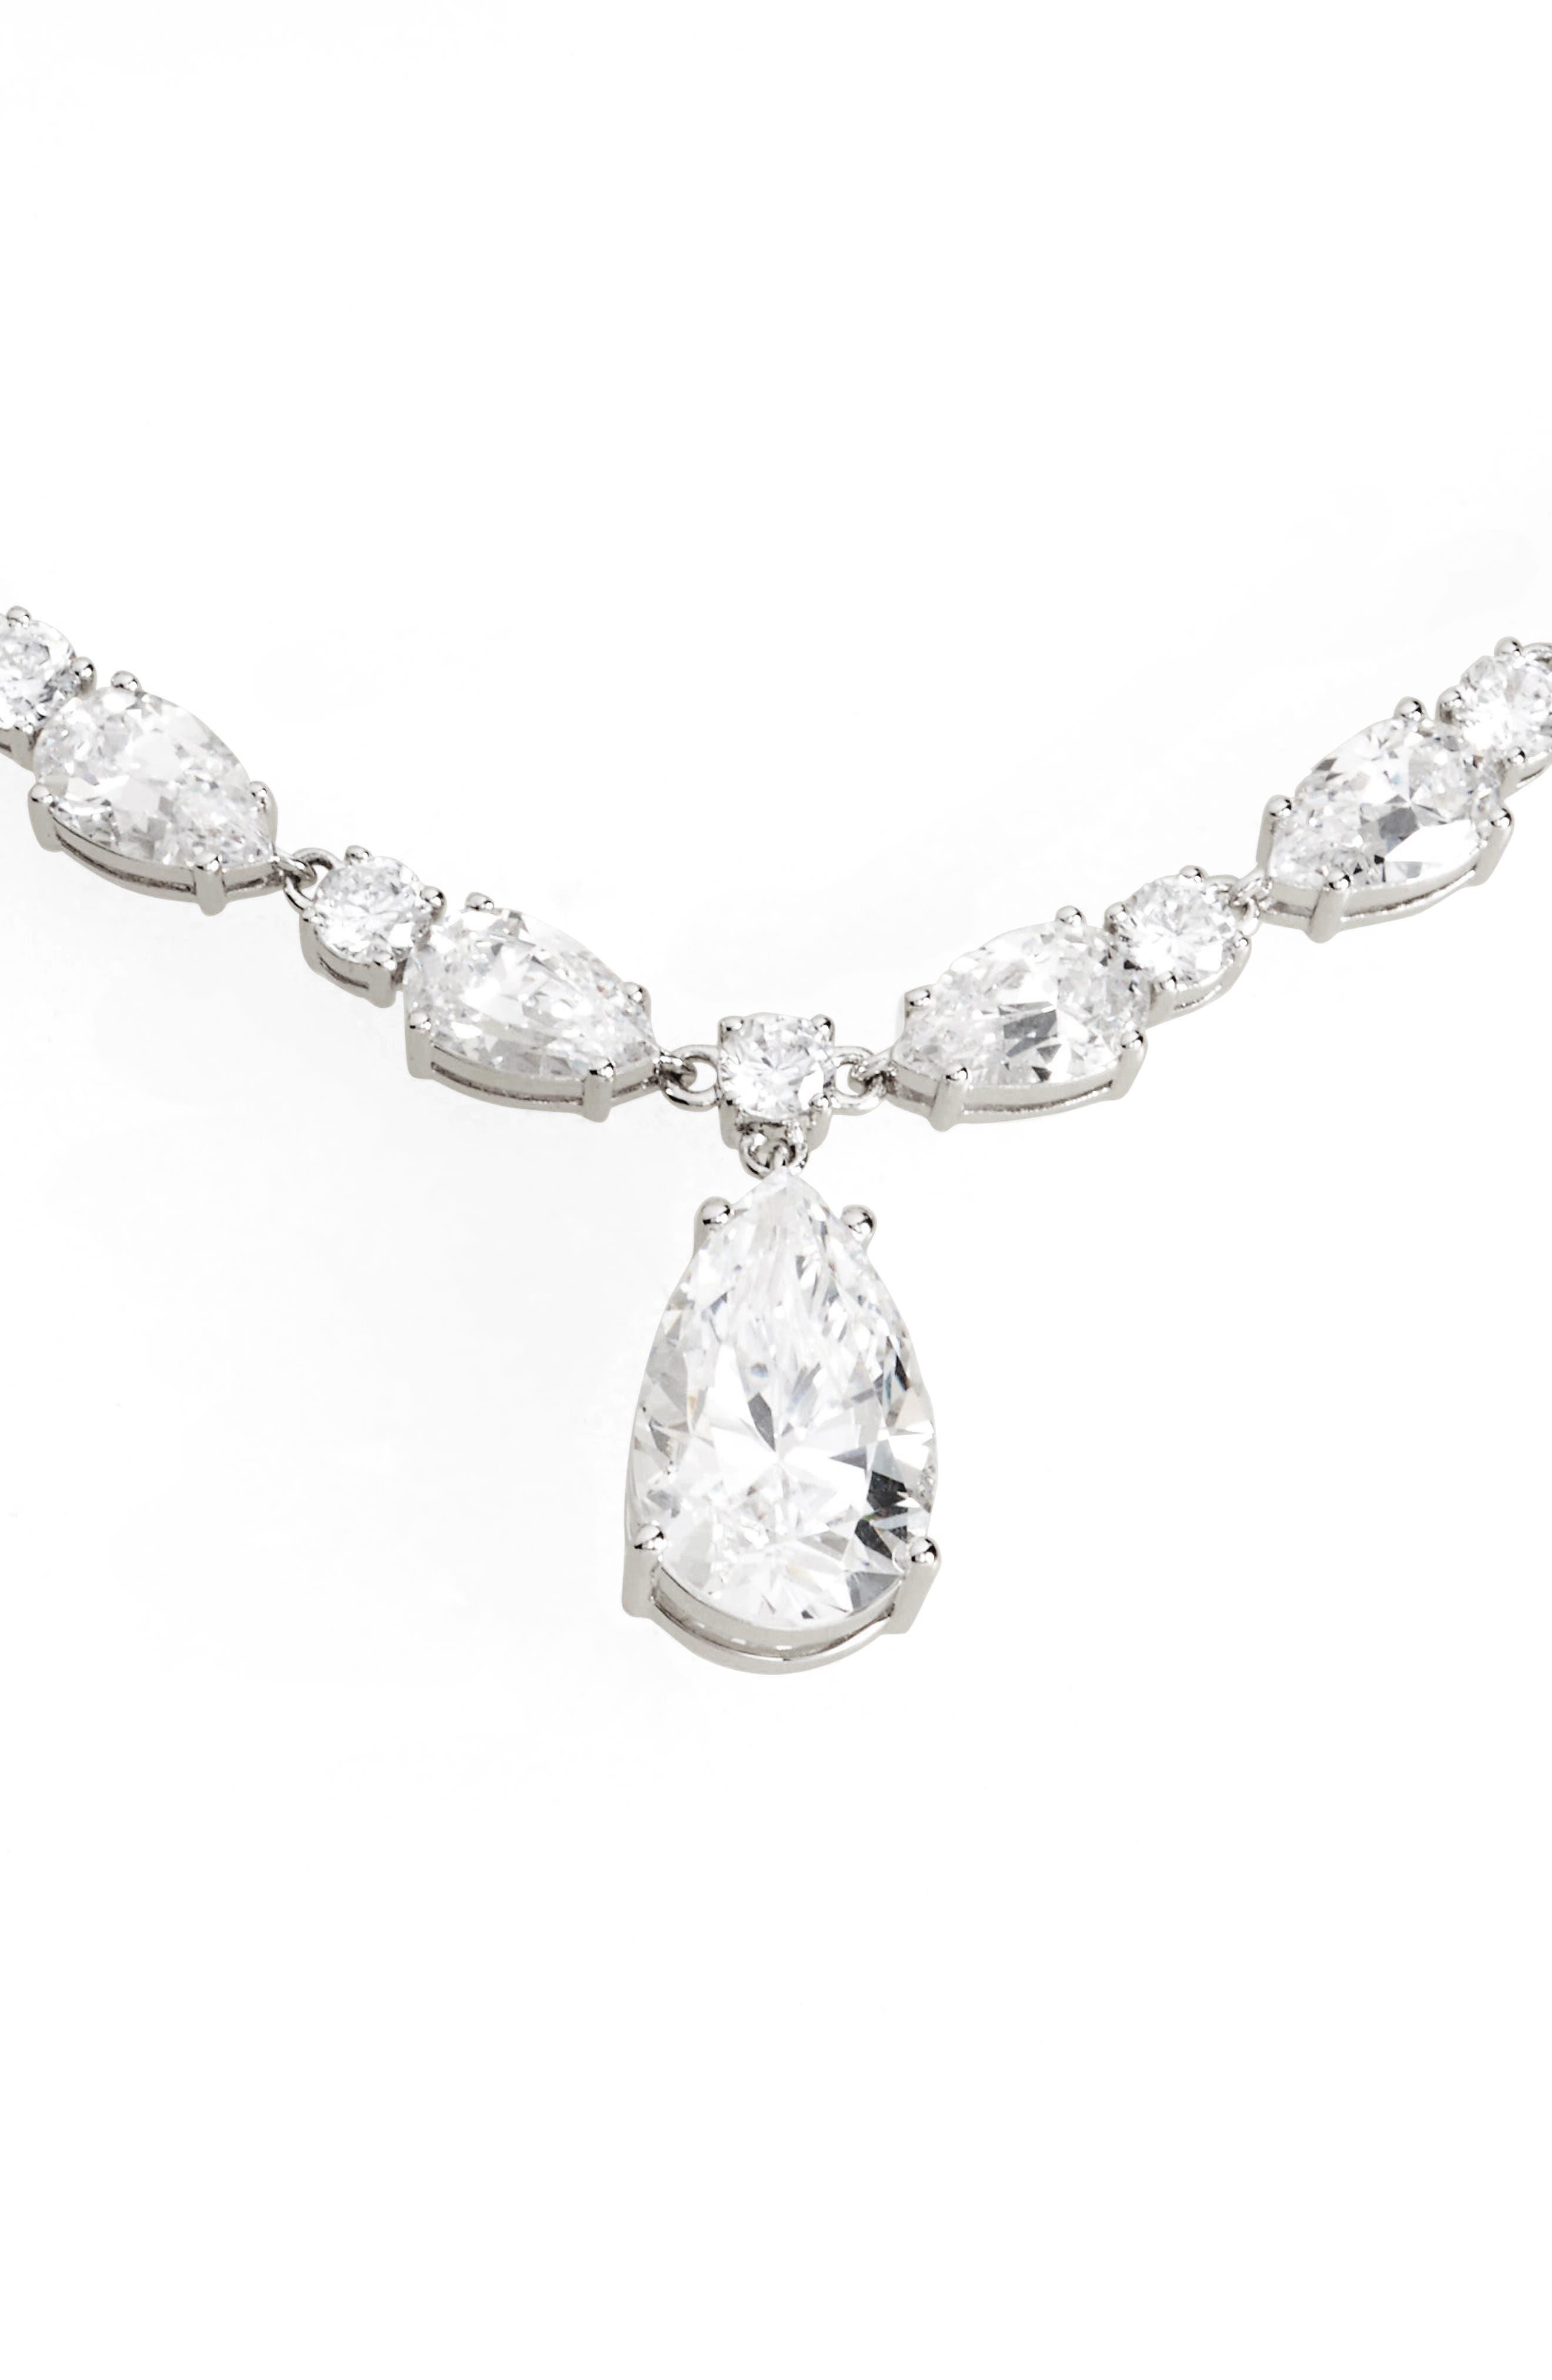 Main Image - Nadri All Around Cubic Zirconia Pendant Necklace